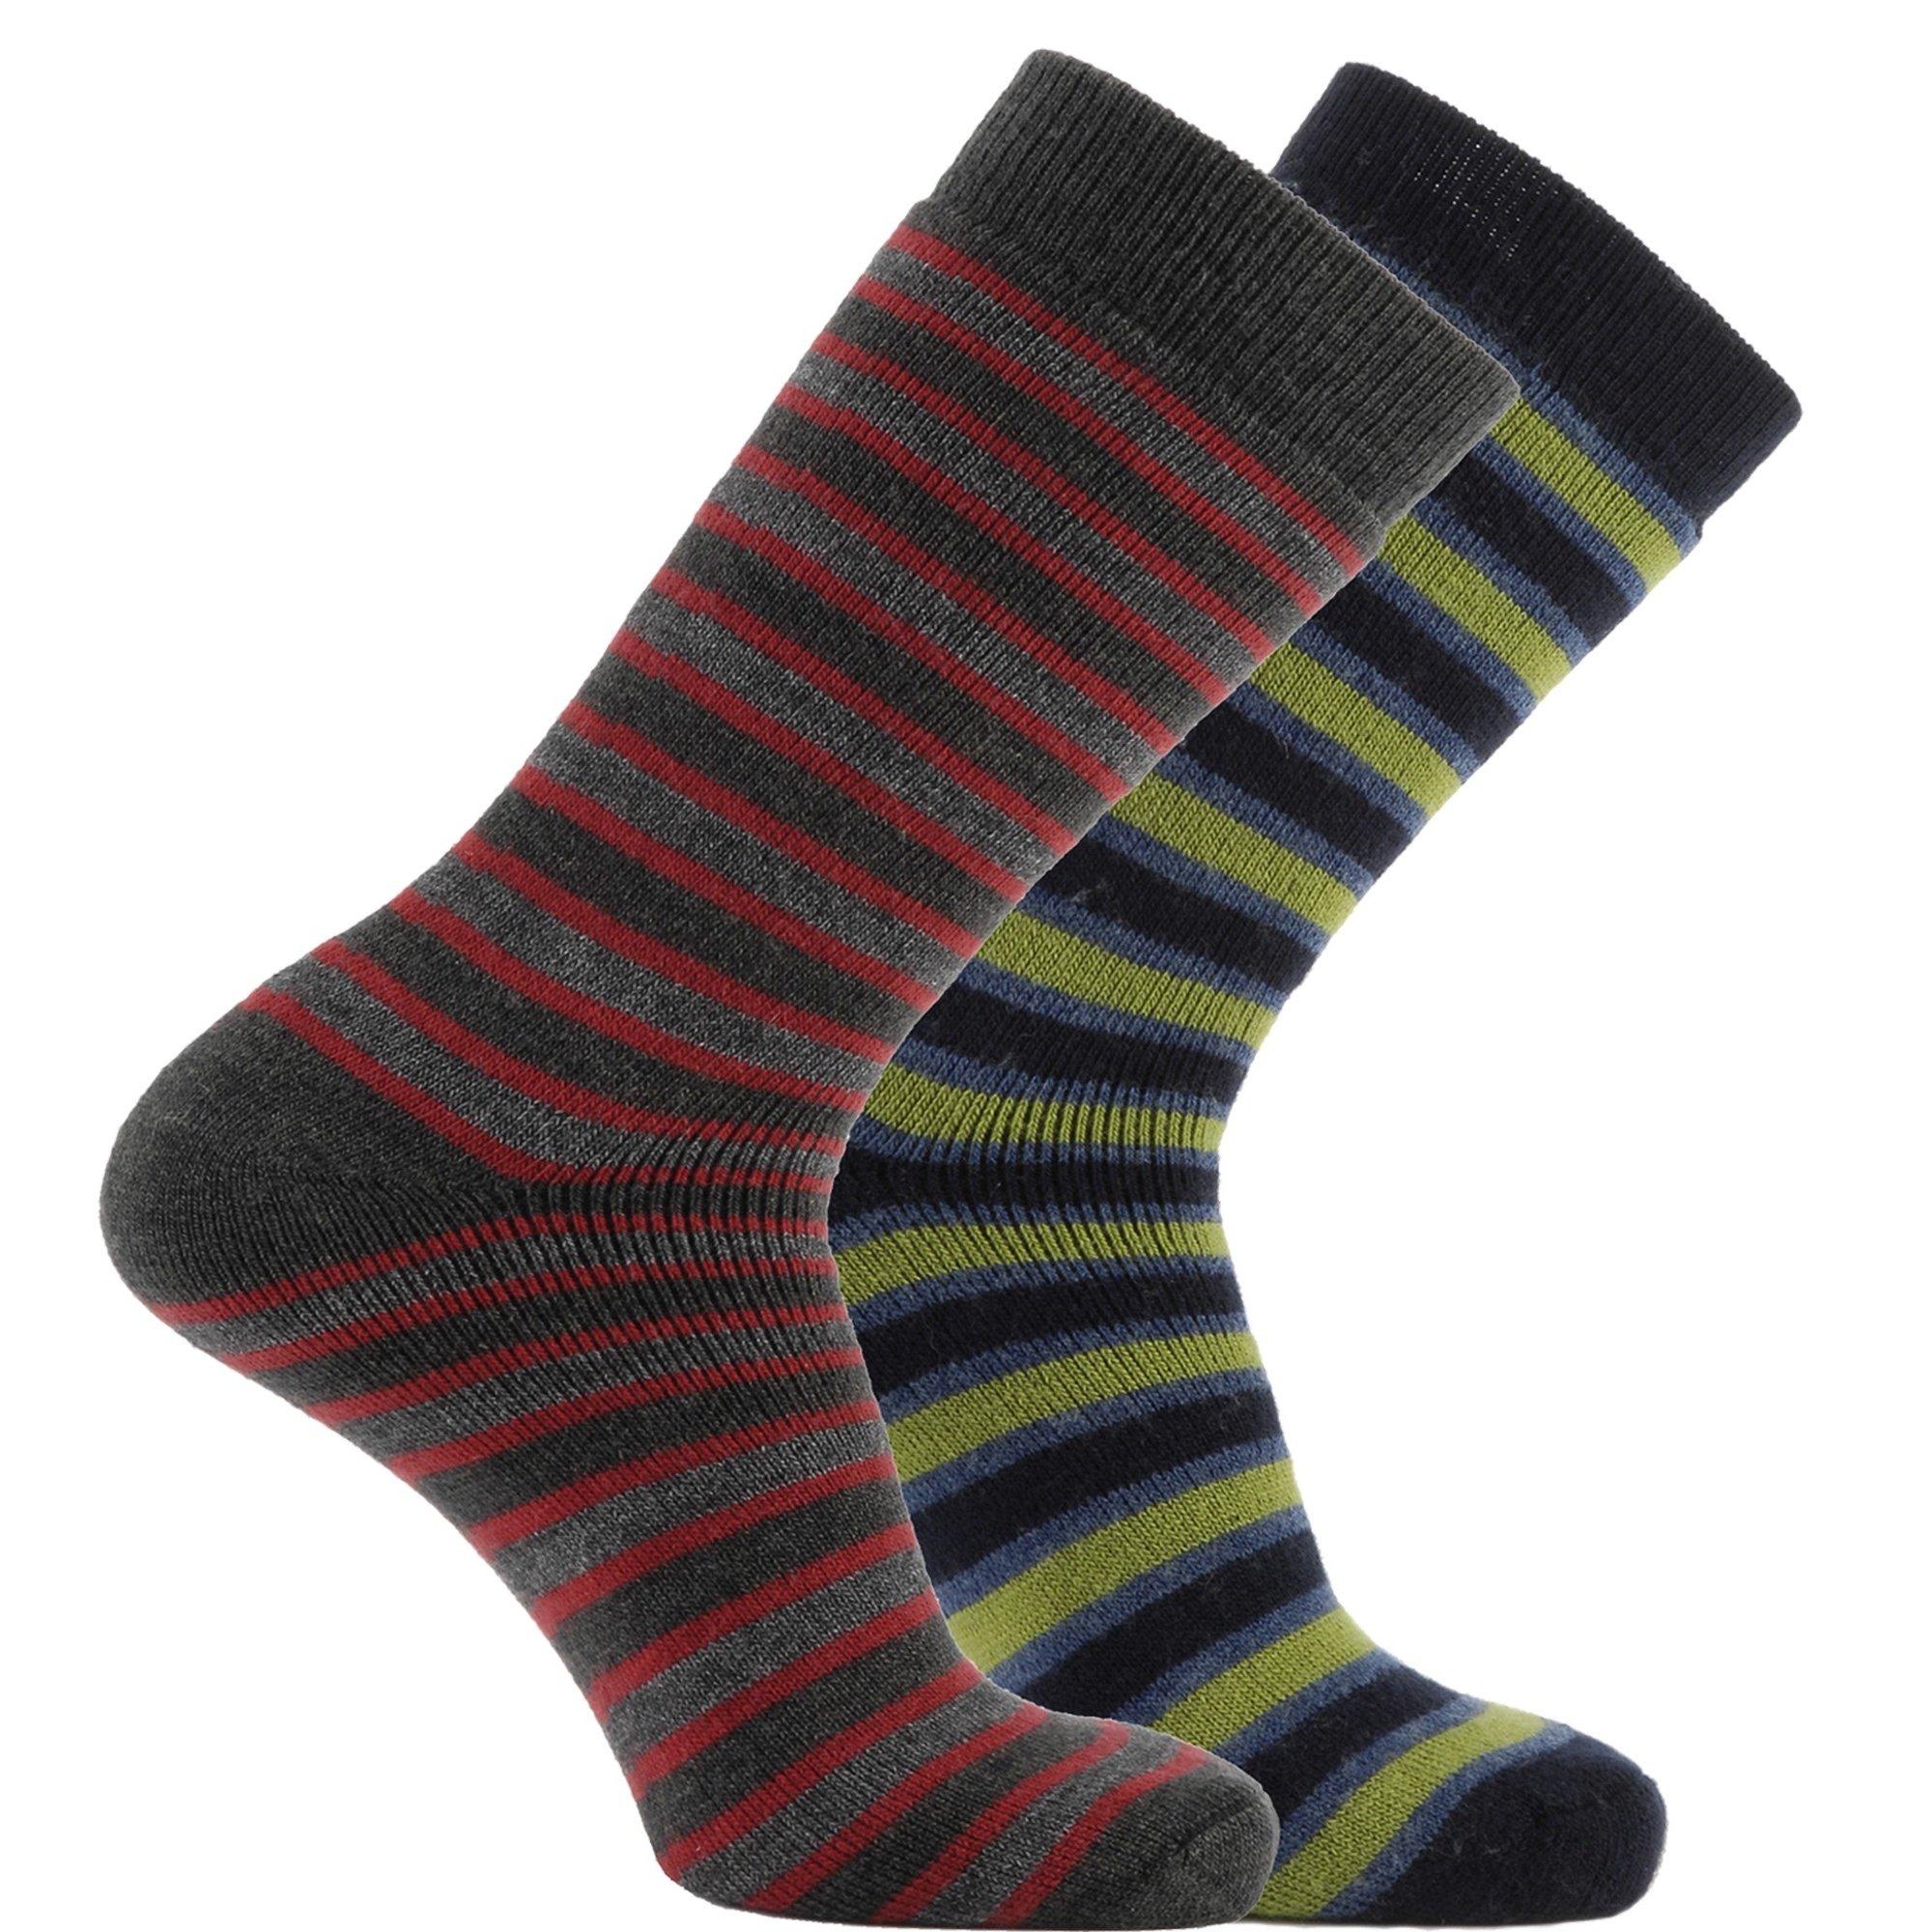 Horizon Unisex Deluxe Merino Outdoor Socks (Pack Of 2) (8.5-12.5 US) (Charcoal/Red & Navy/Green (Stripes))